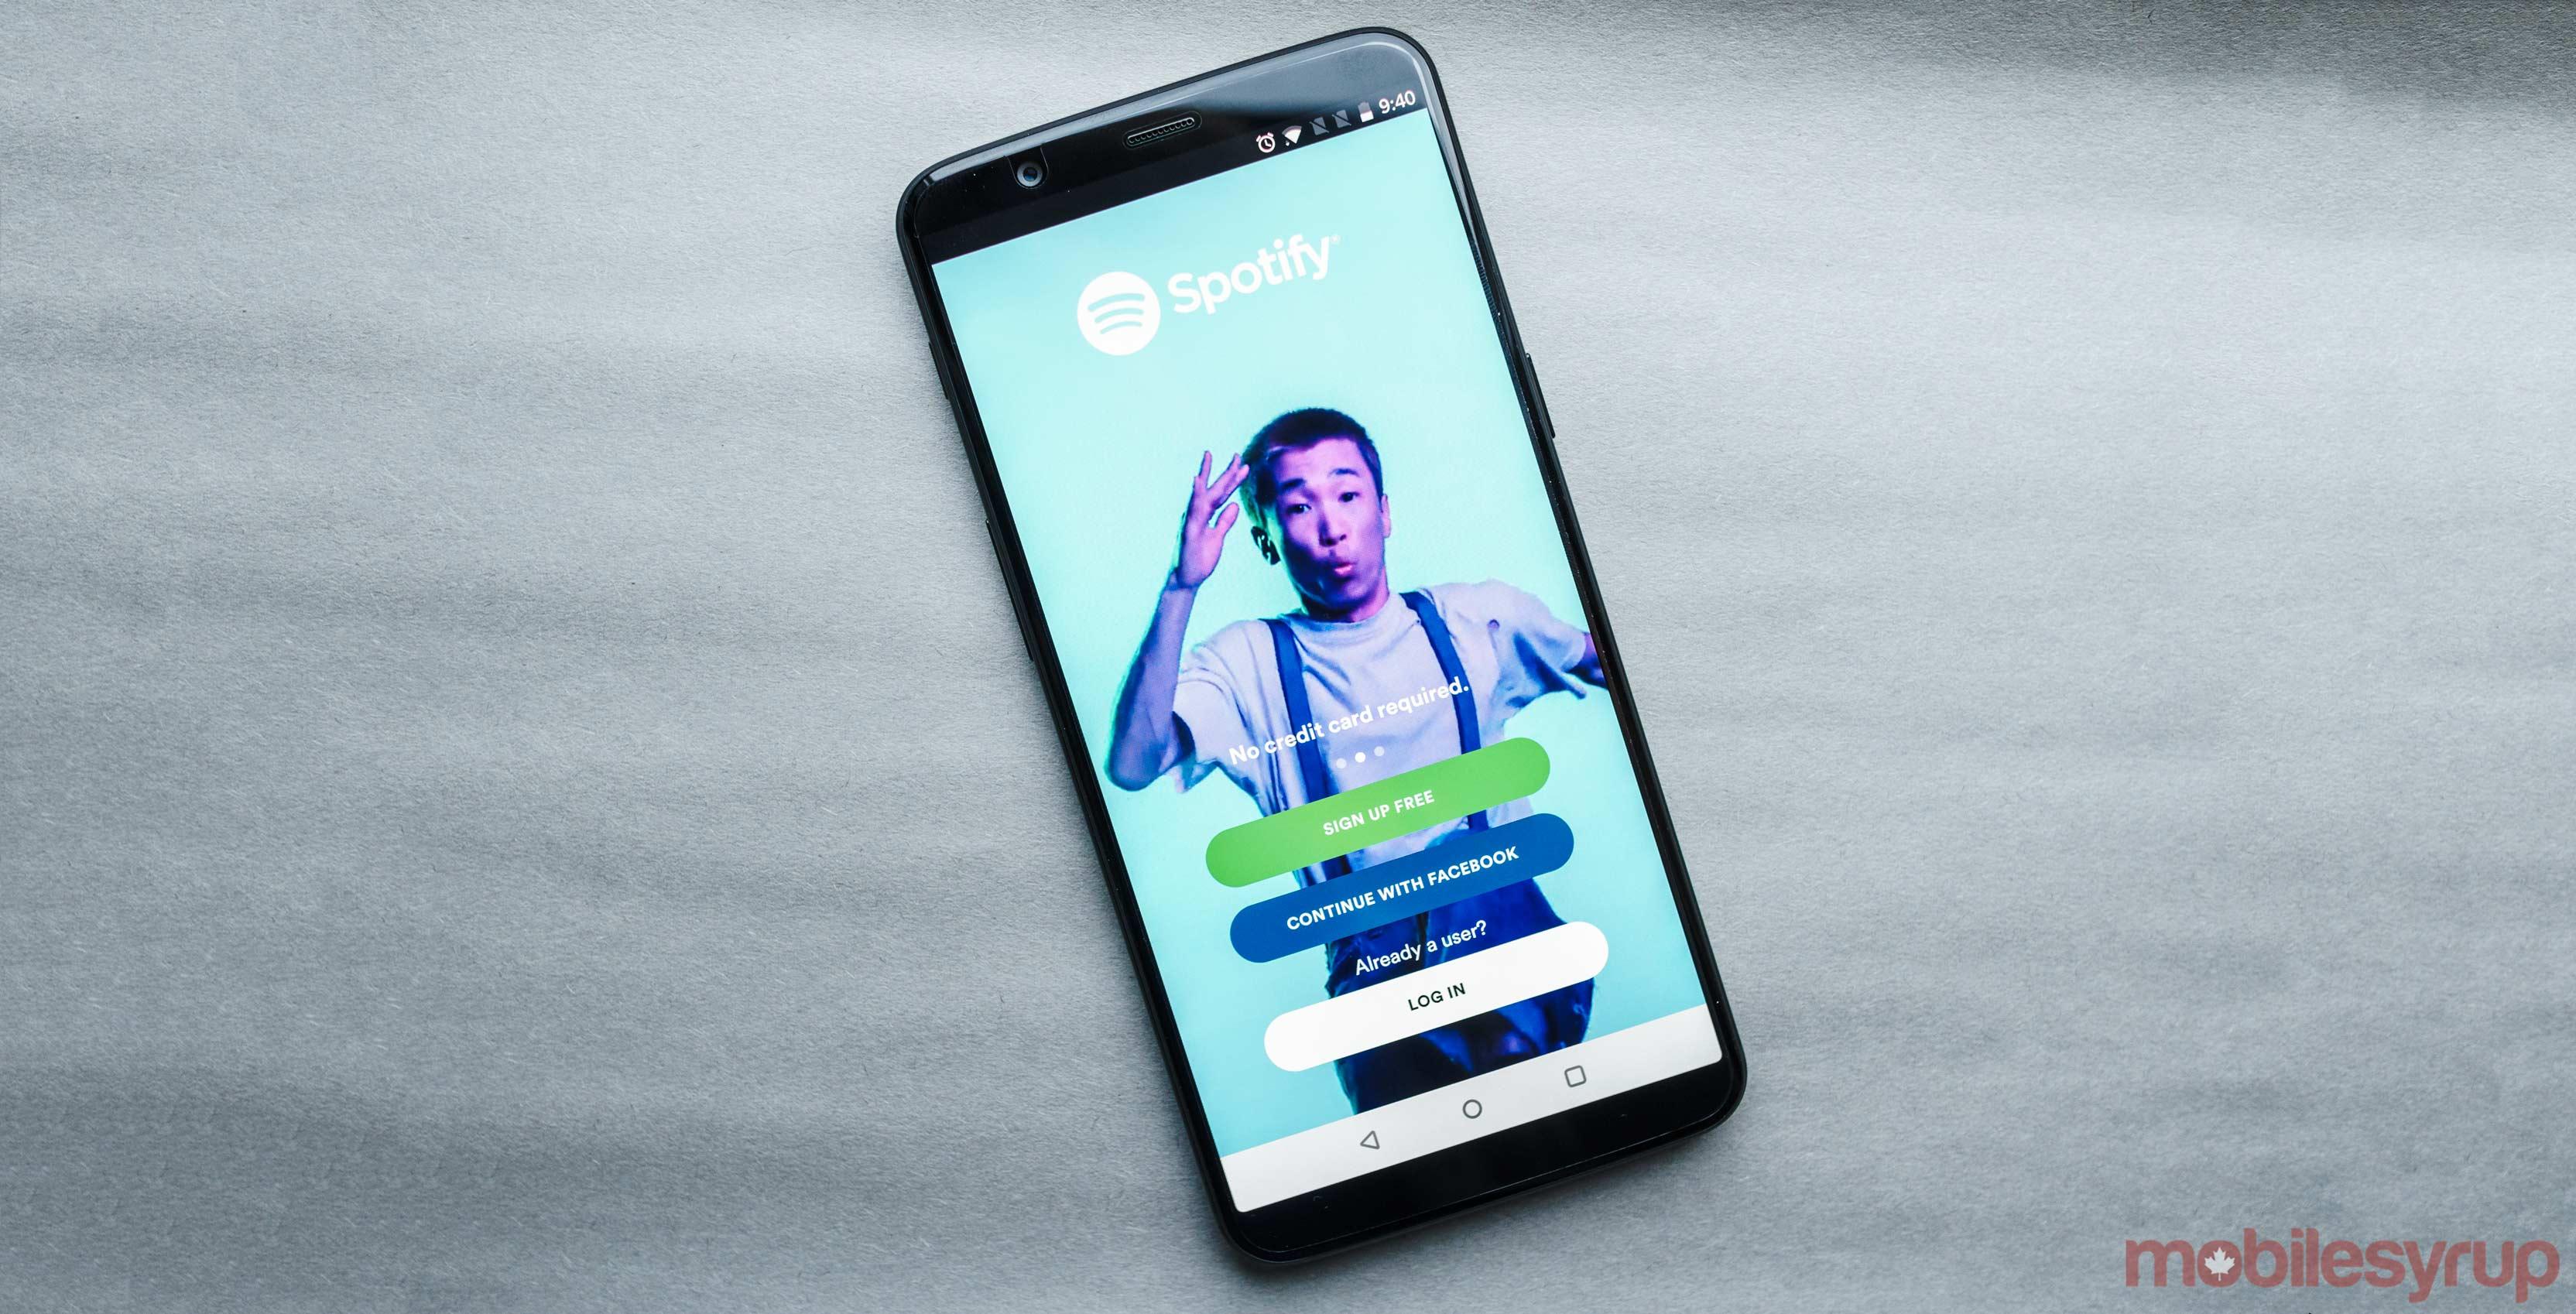 The Spotify login screen